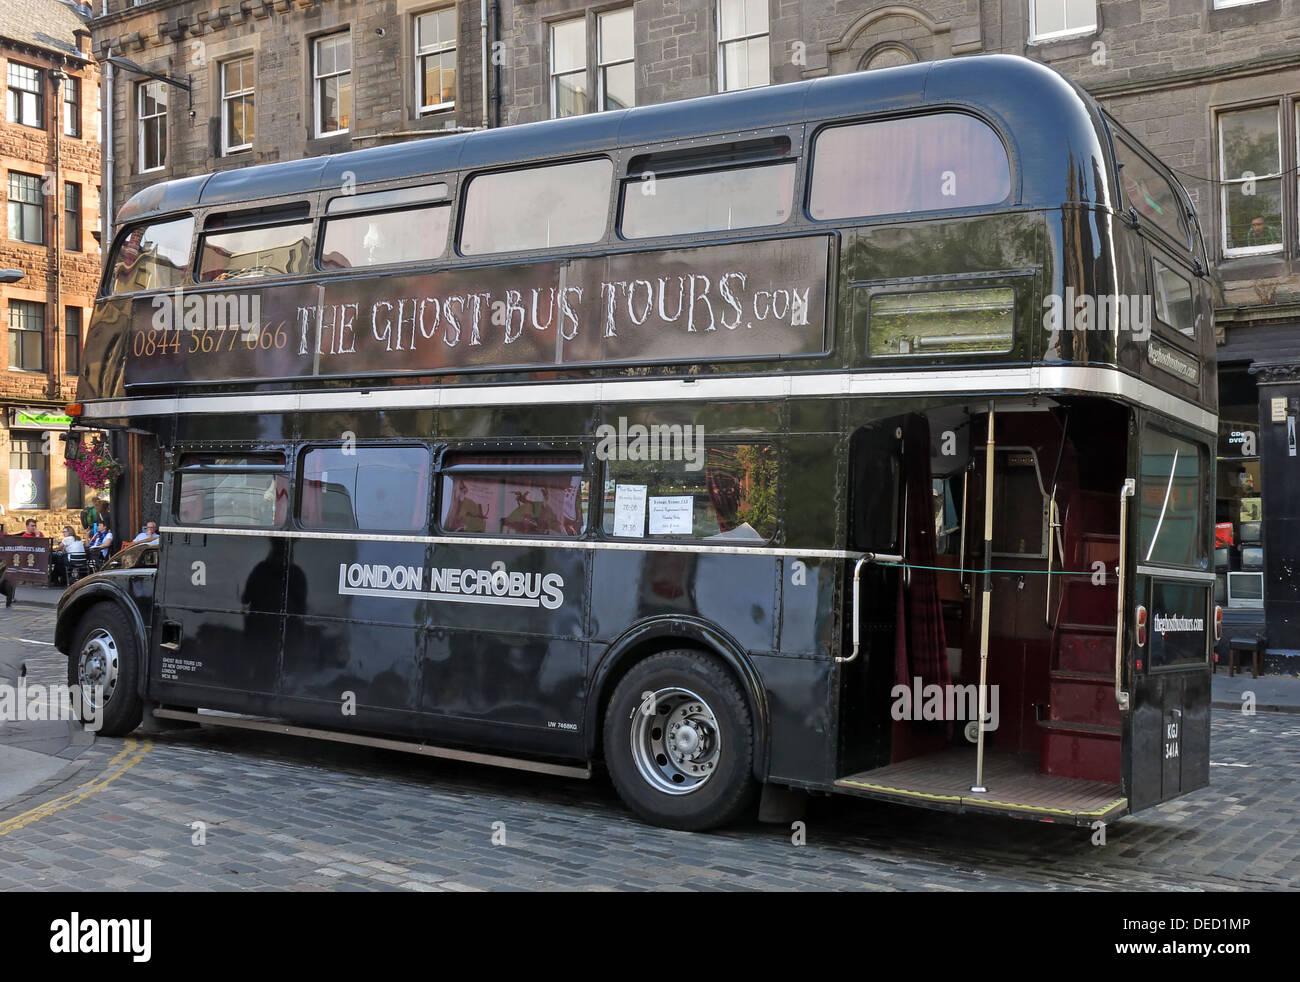 ghost,bus,ghostbus,tours,tour,tourist,tourism,dead,goth,gothic,routemaster,red,classic,transport,transportation,LT,London Transport,black london bus,ghost,festival,Edinburgh festival,EDN,August,GoTonySmith,Buy Pictures of,Buy Images Of